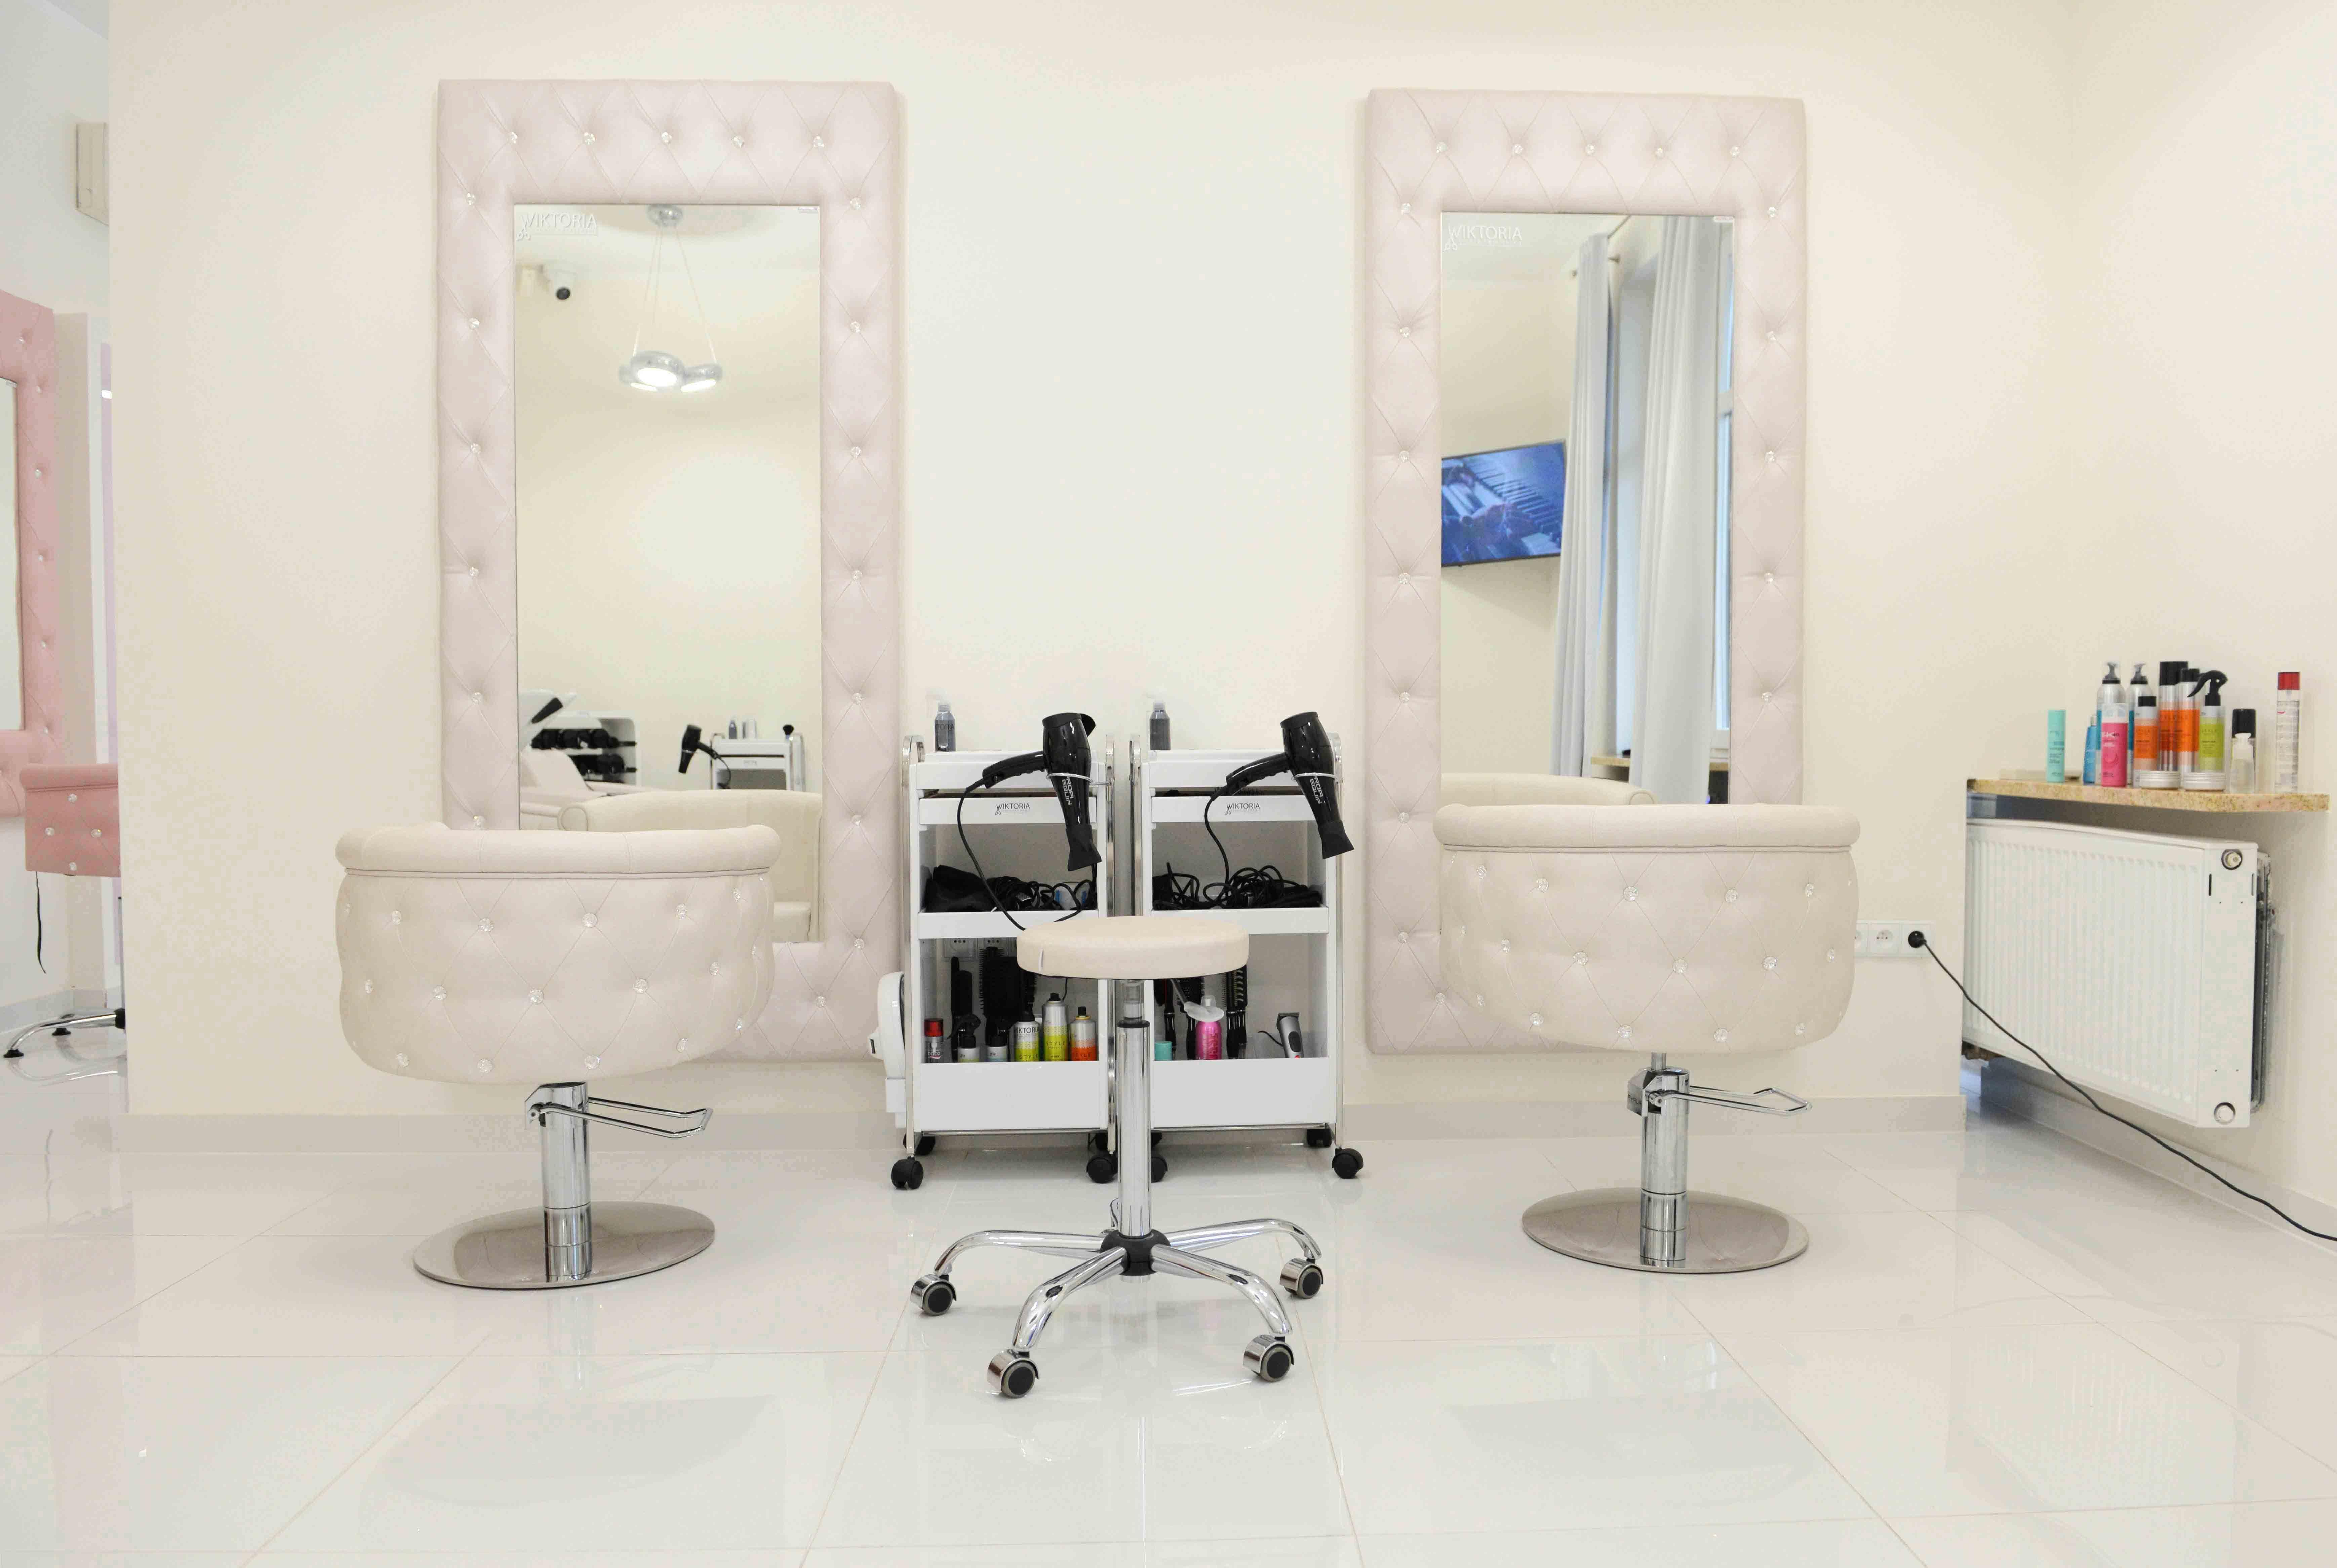 Hair Salon Studio Wiktoria P Poland Obesession Styling Chairs And Obsession Styling Units Made With Svarowski Crysta Salon Furniture Salon Chairs Salon Design